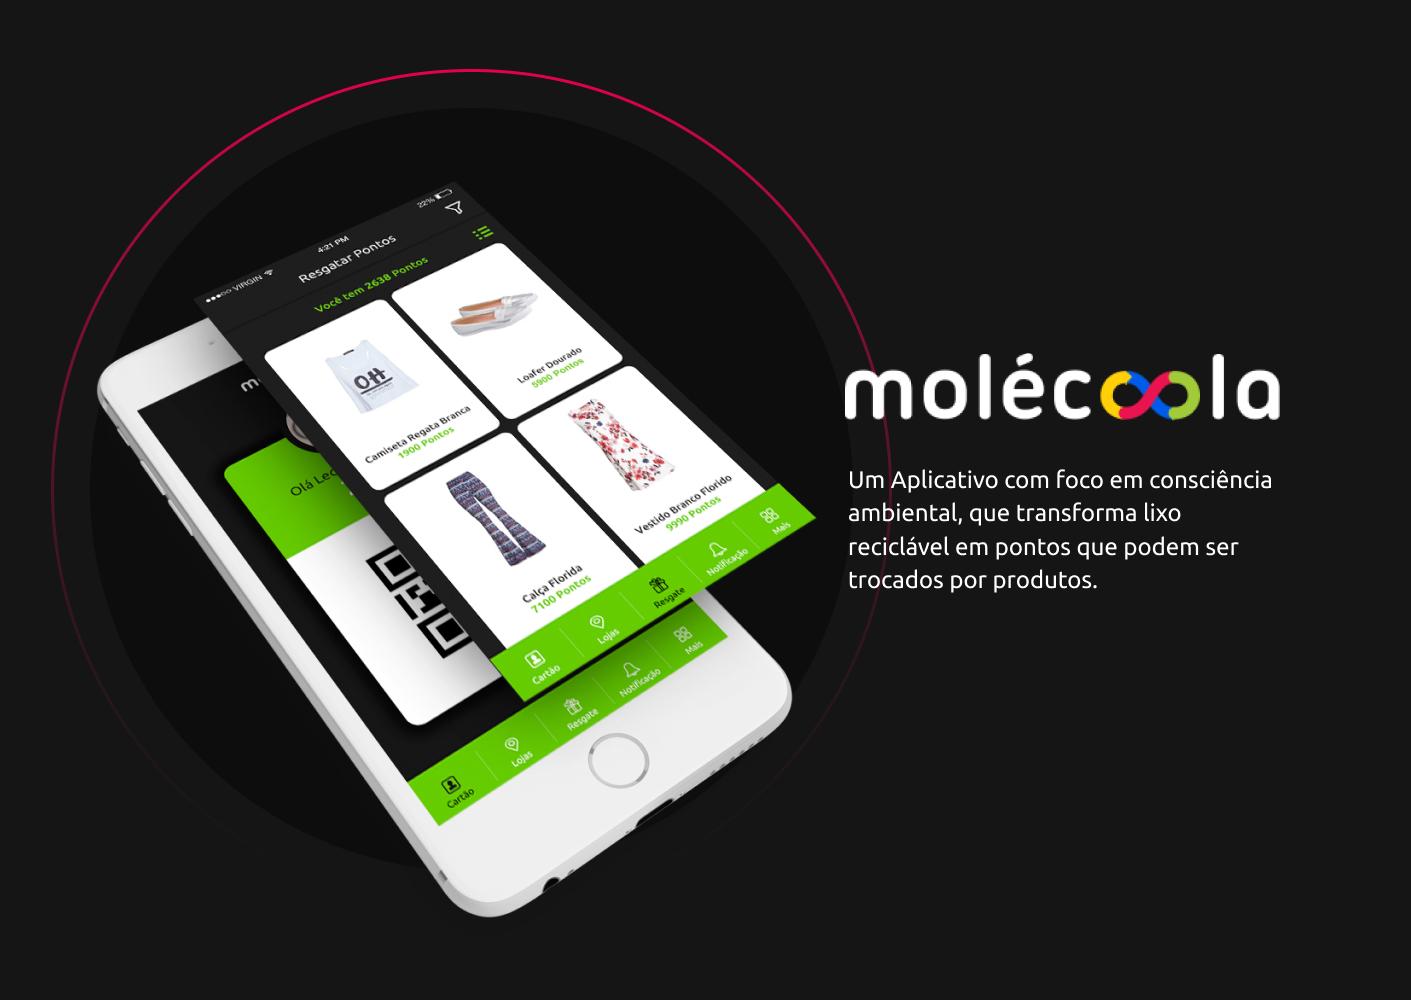 Aplicativo Molecoola